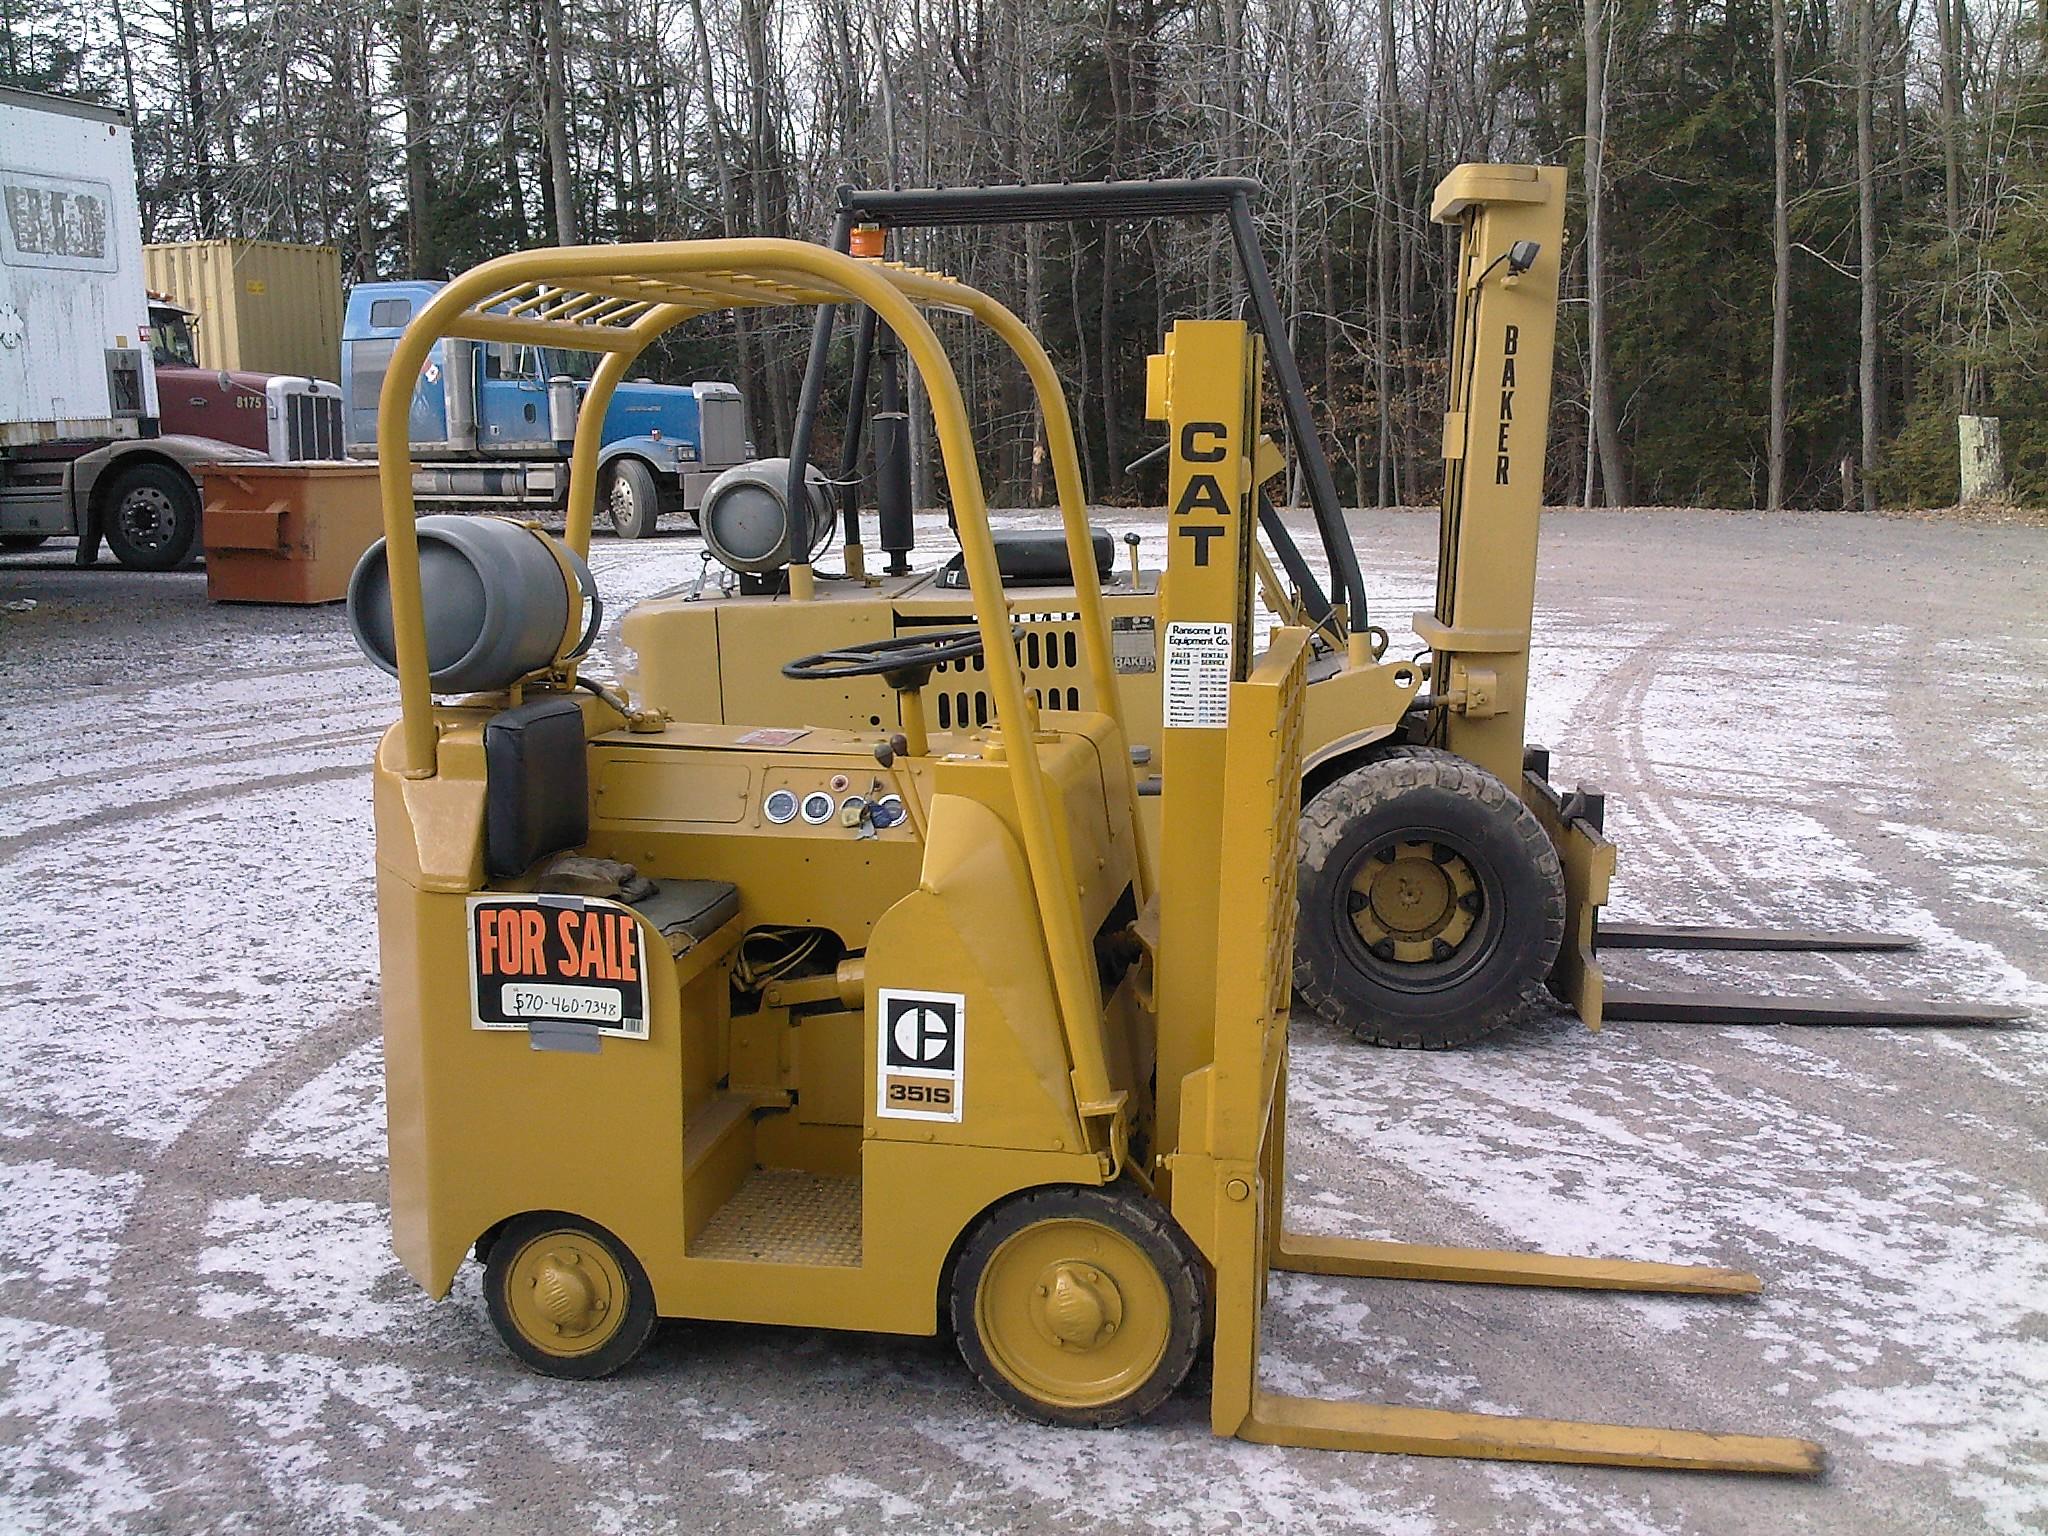 heavyequipment/1123081045a.jpg